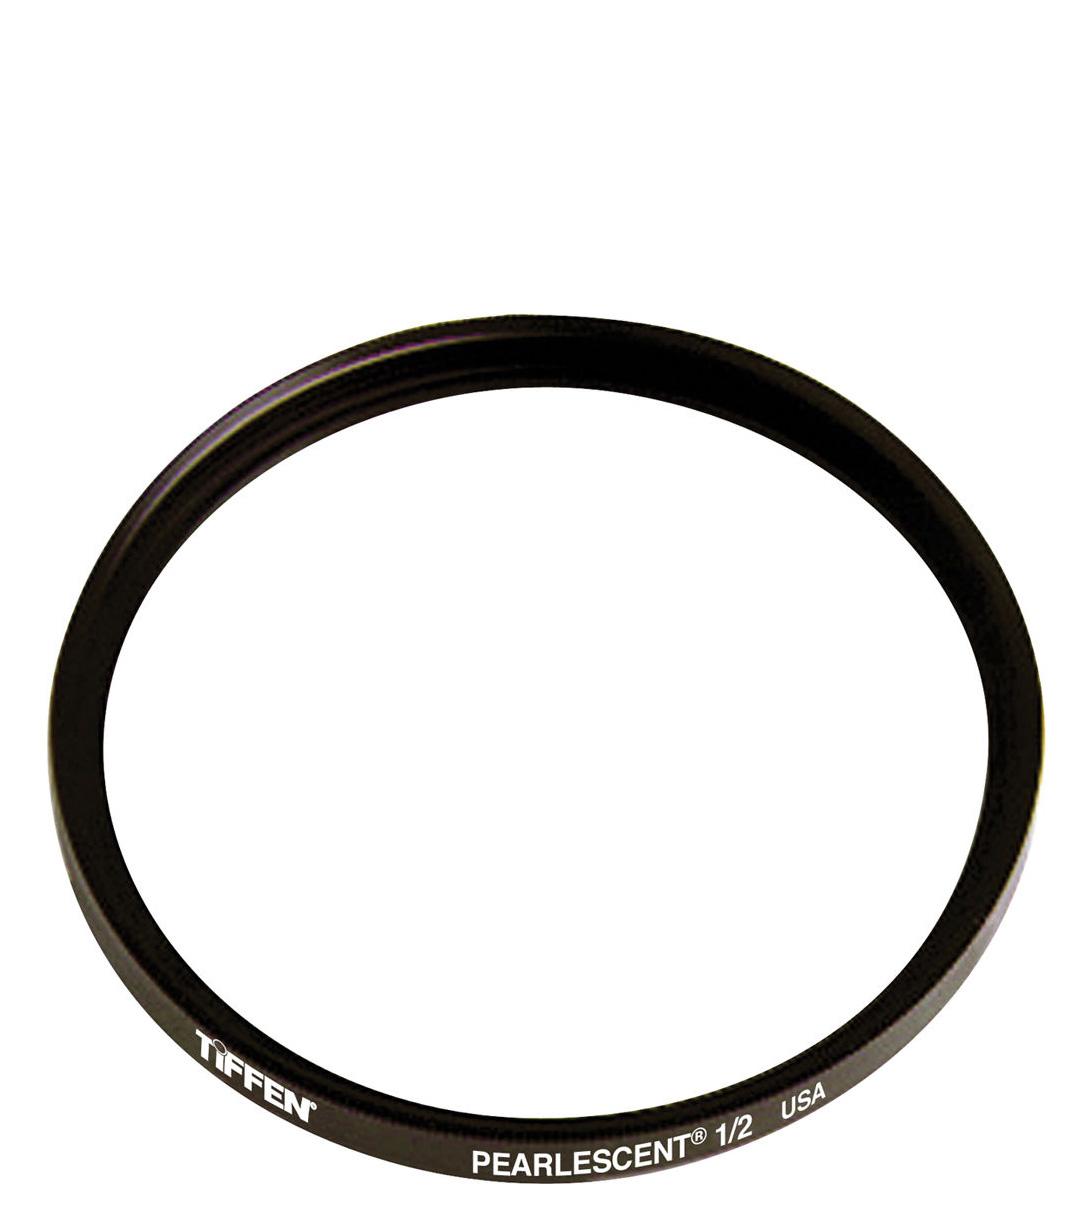 Filtro de lente Tiffen - Pearlescent 1/2 - 82mm